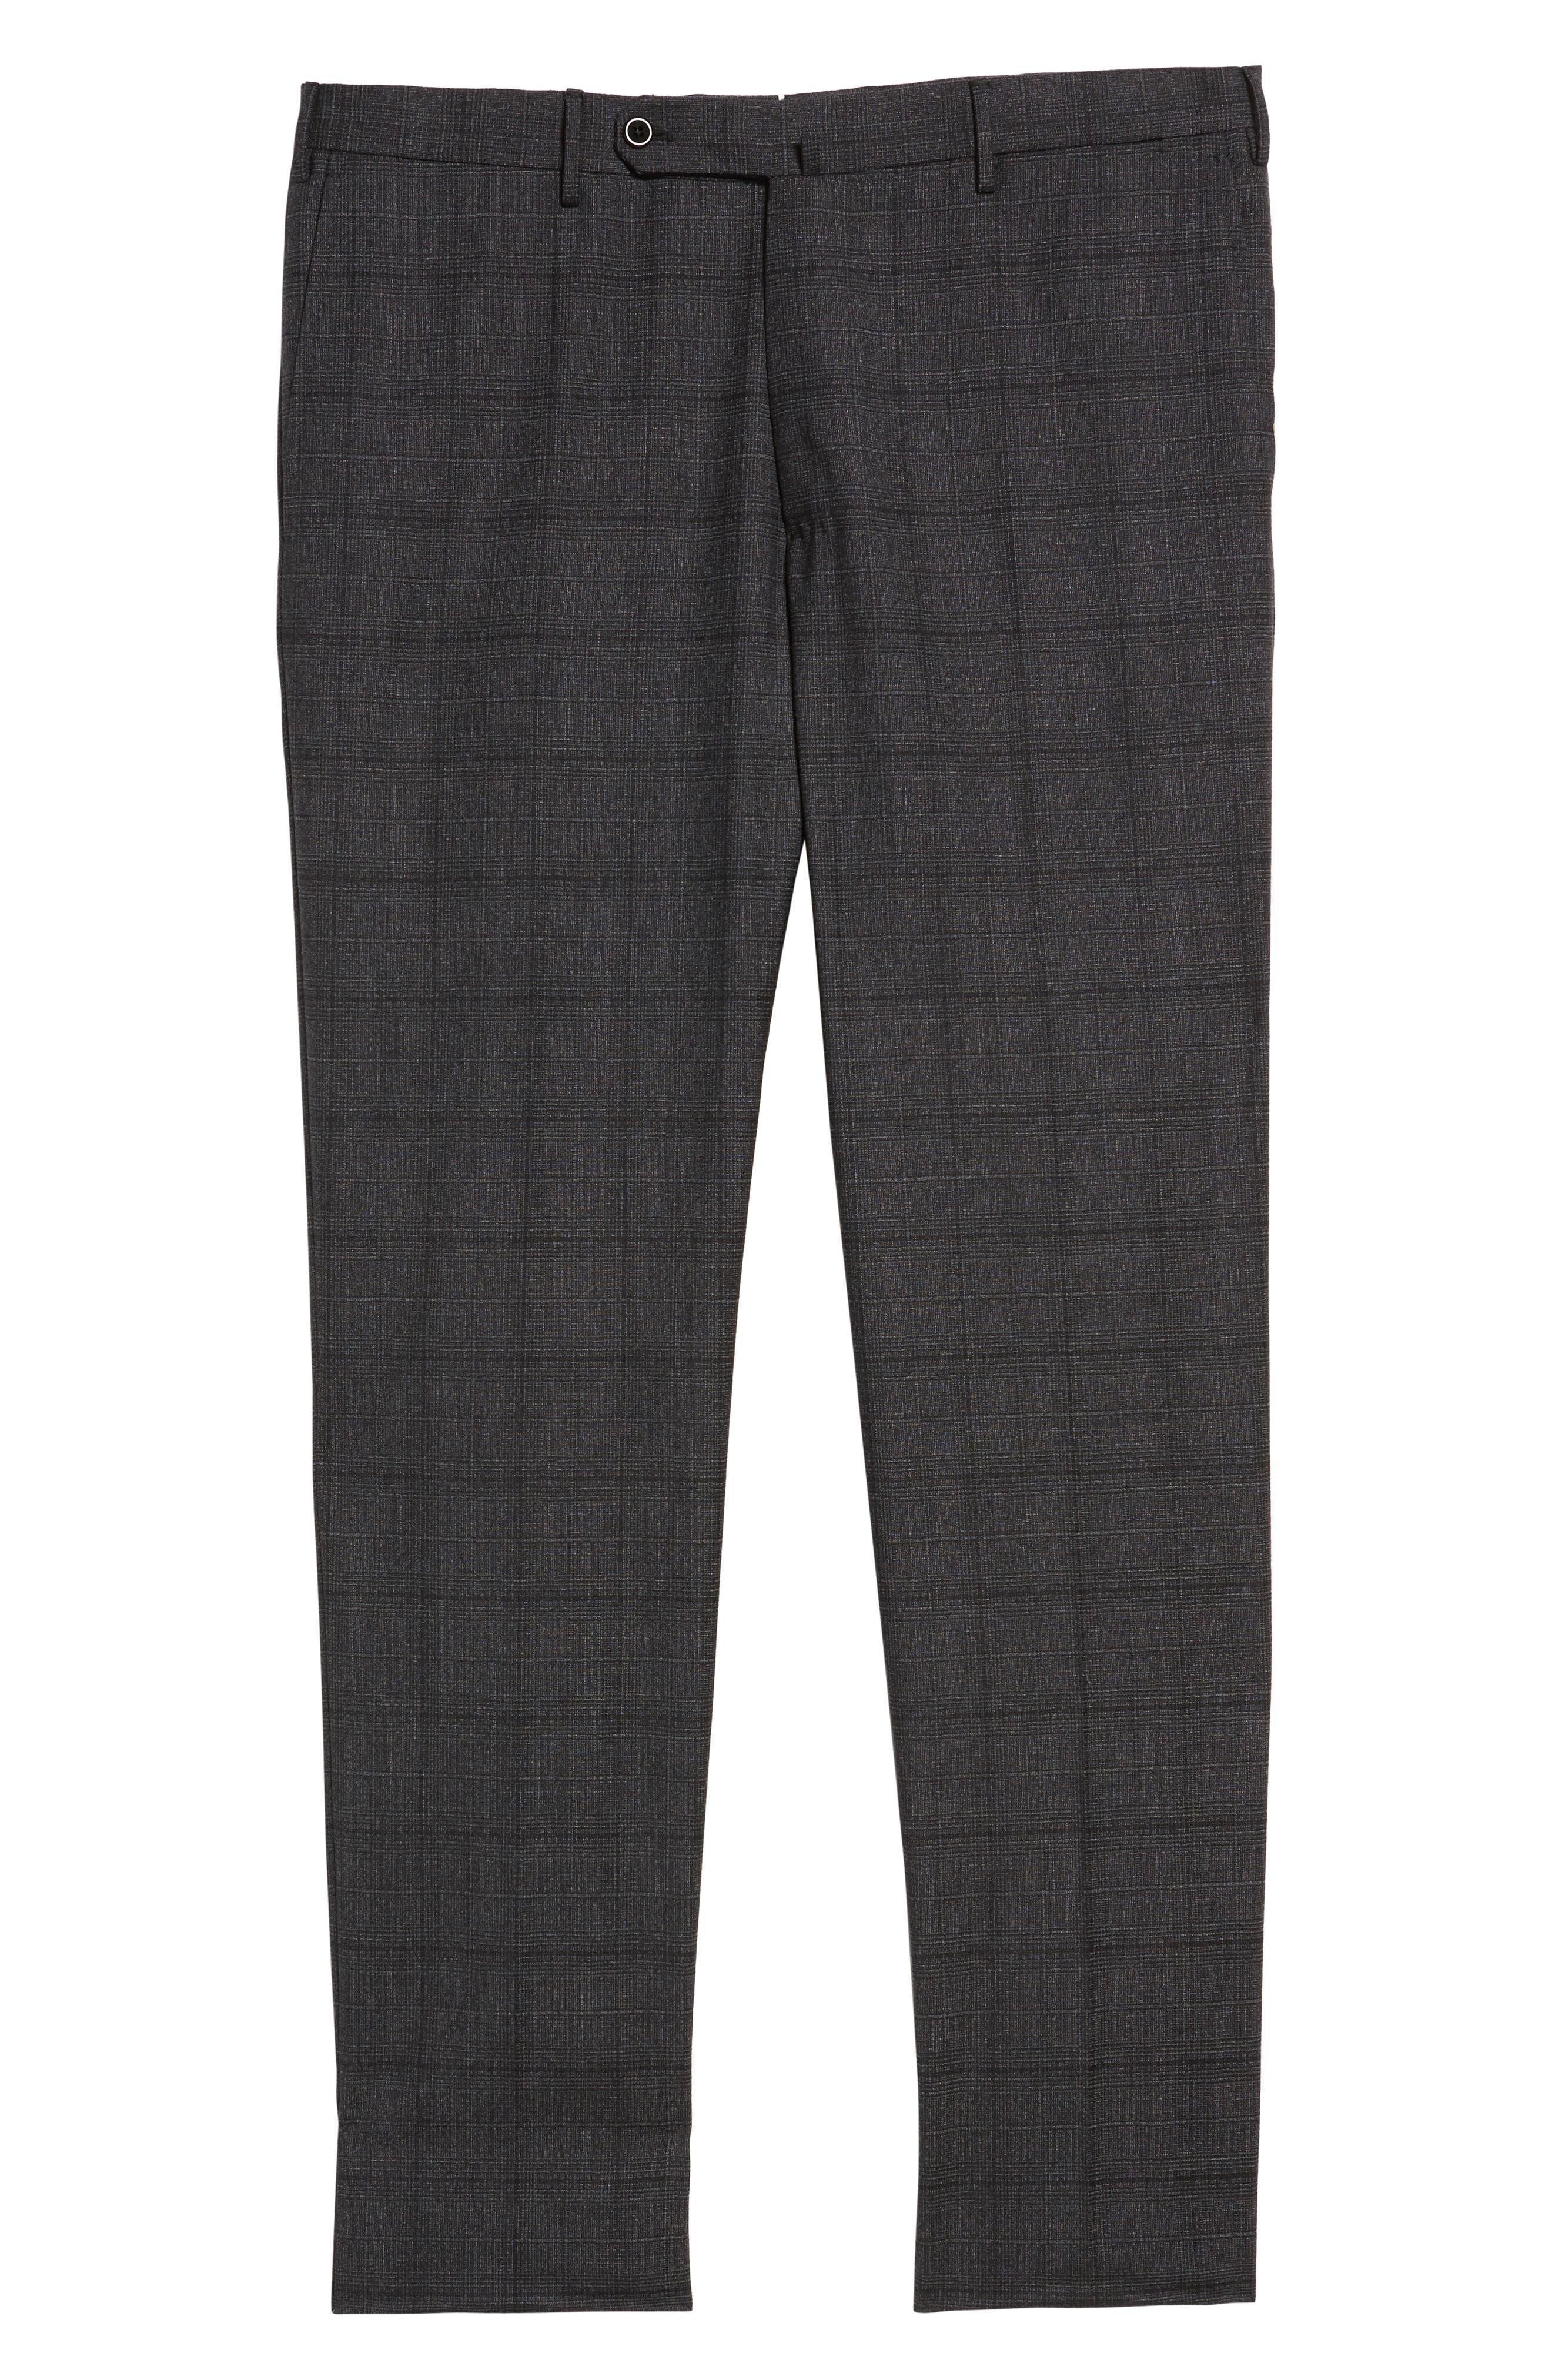 Benson Flat Front Trousers,                             Alternate thumbnail 6, color,                             015